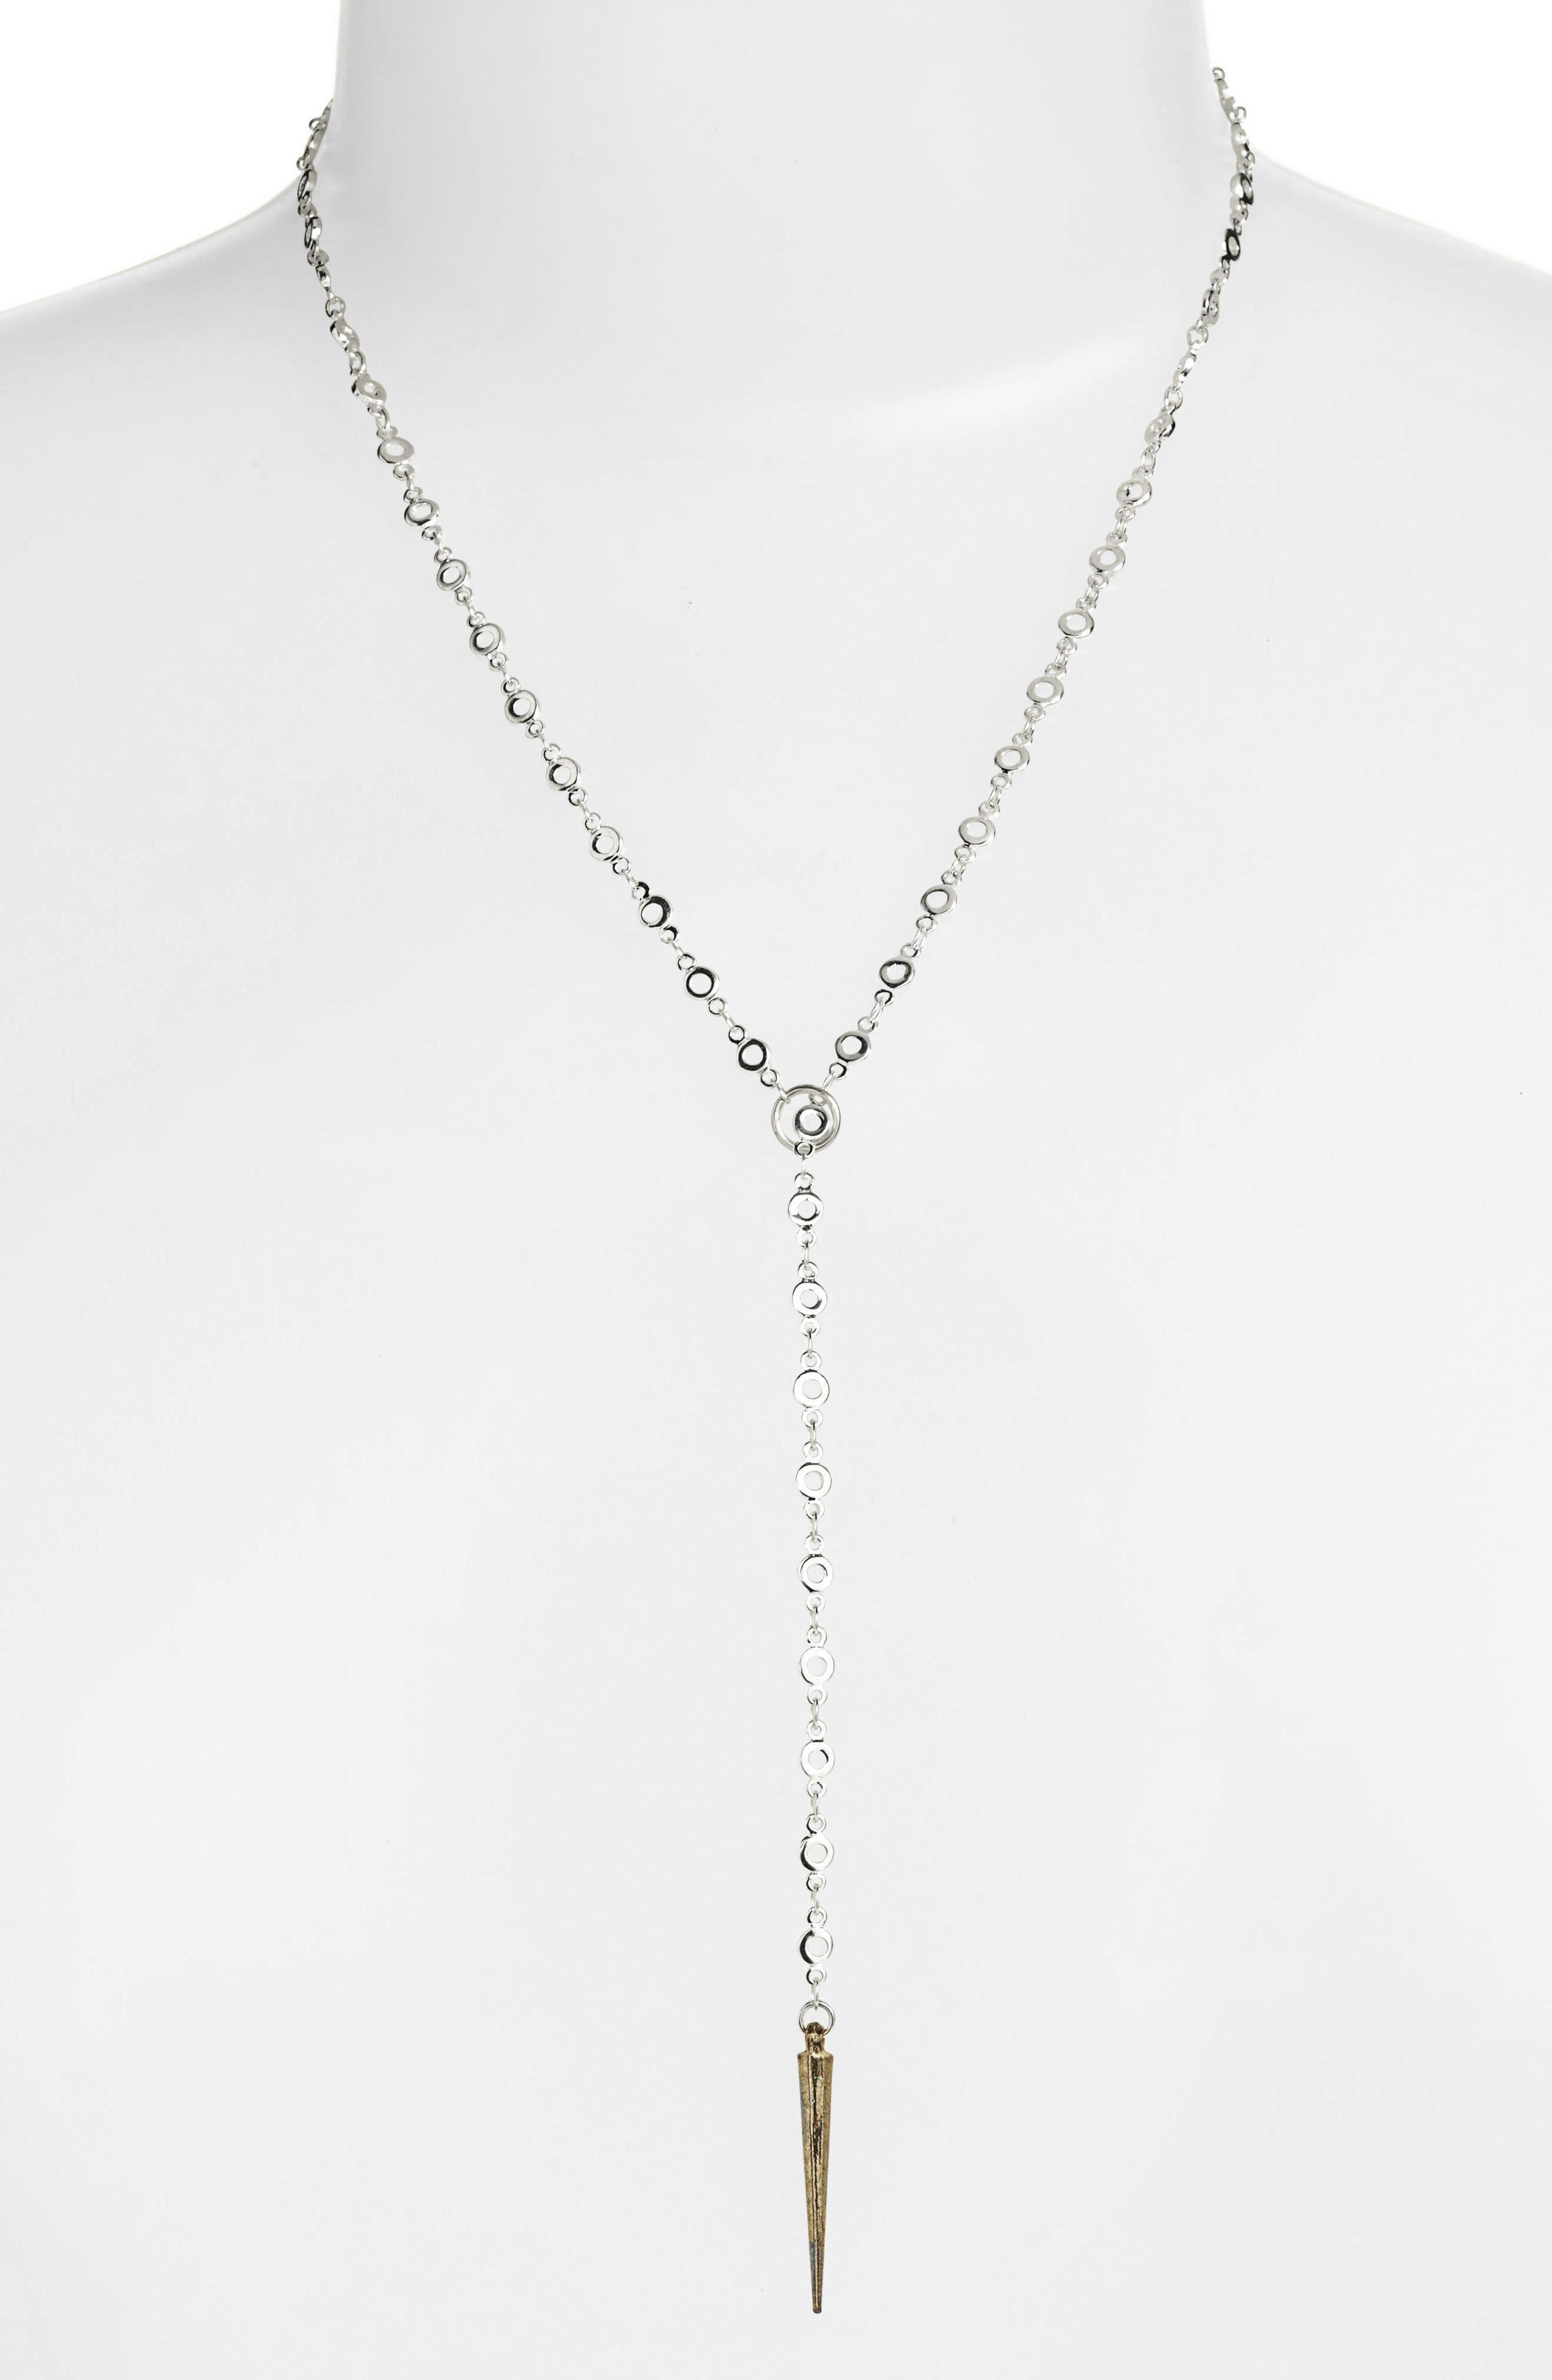 Karen London Everyday Lariat Necklace